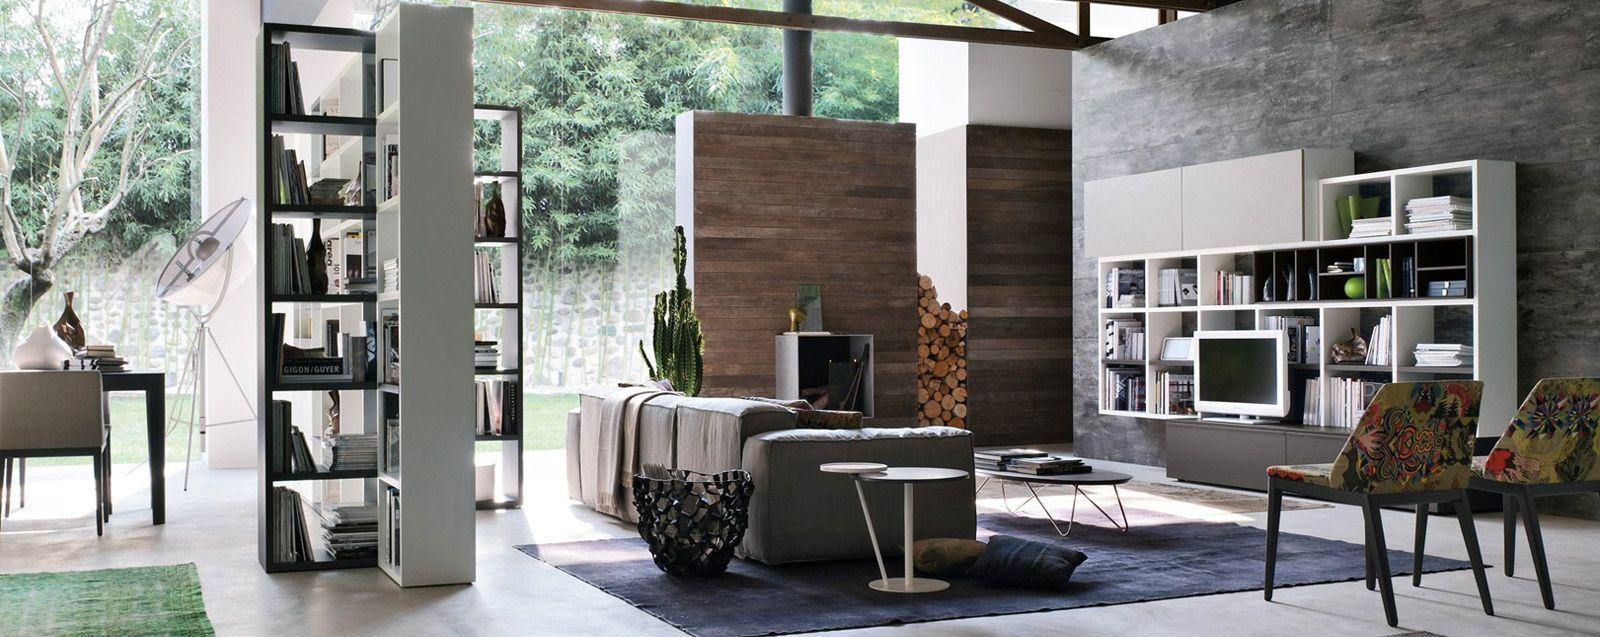 Arredamento mobili stile classico stile moderno for Arredamento moderno contemporaneo